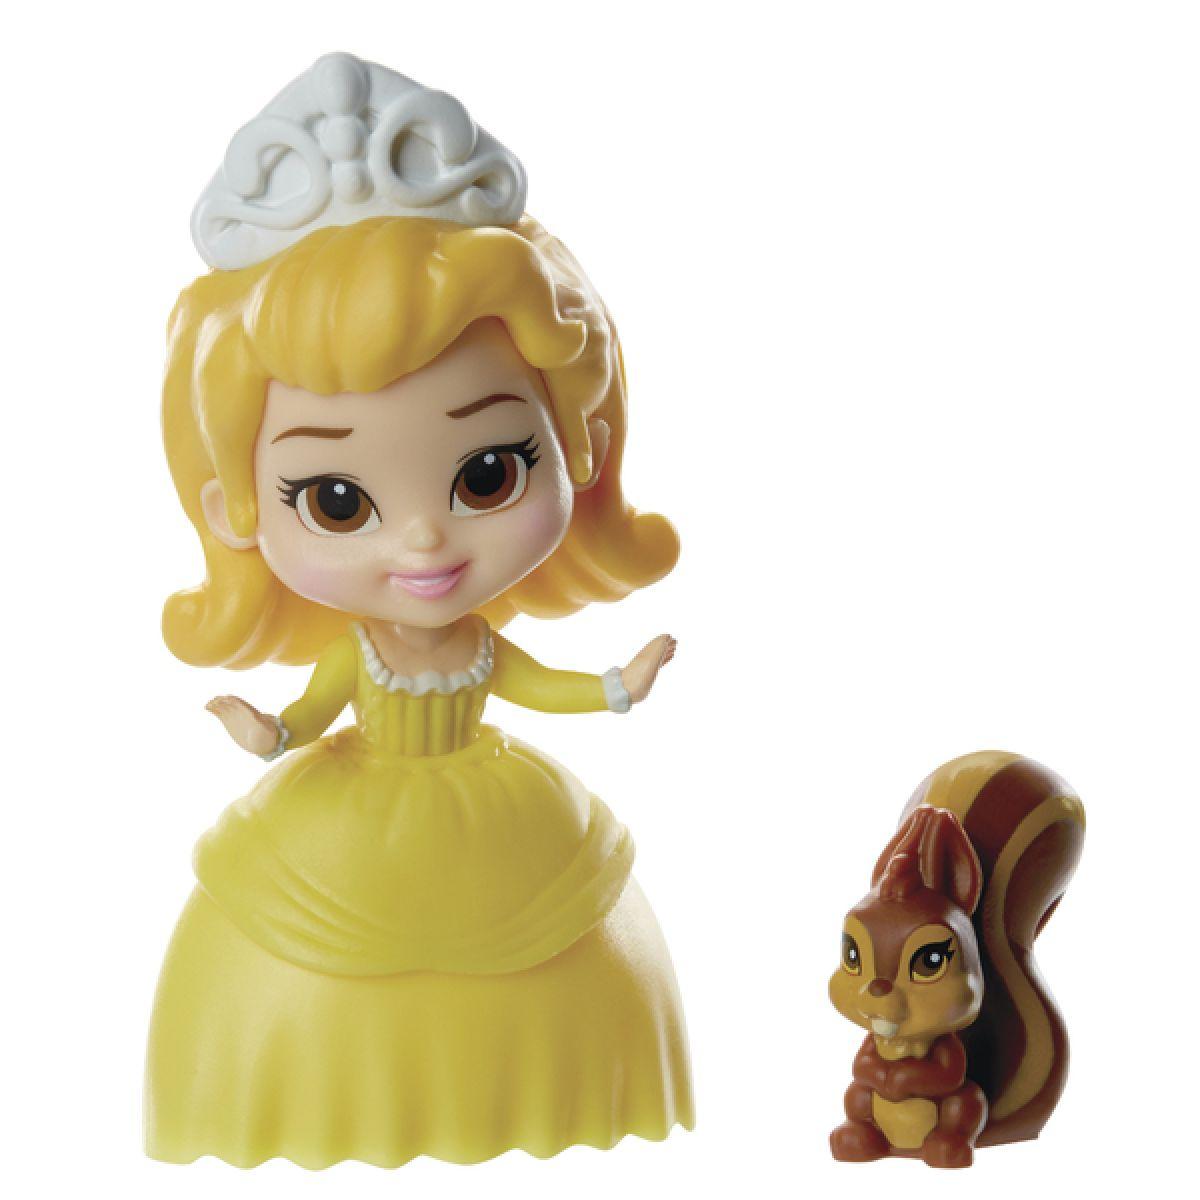 Jakks Pacific Disney Mini princezna a kamarád Amber and Whatnaught